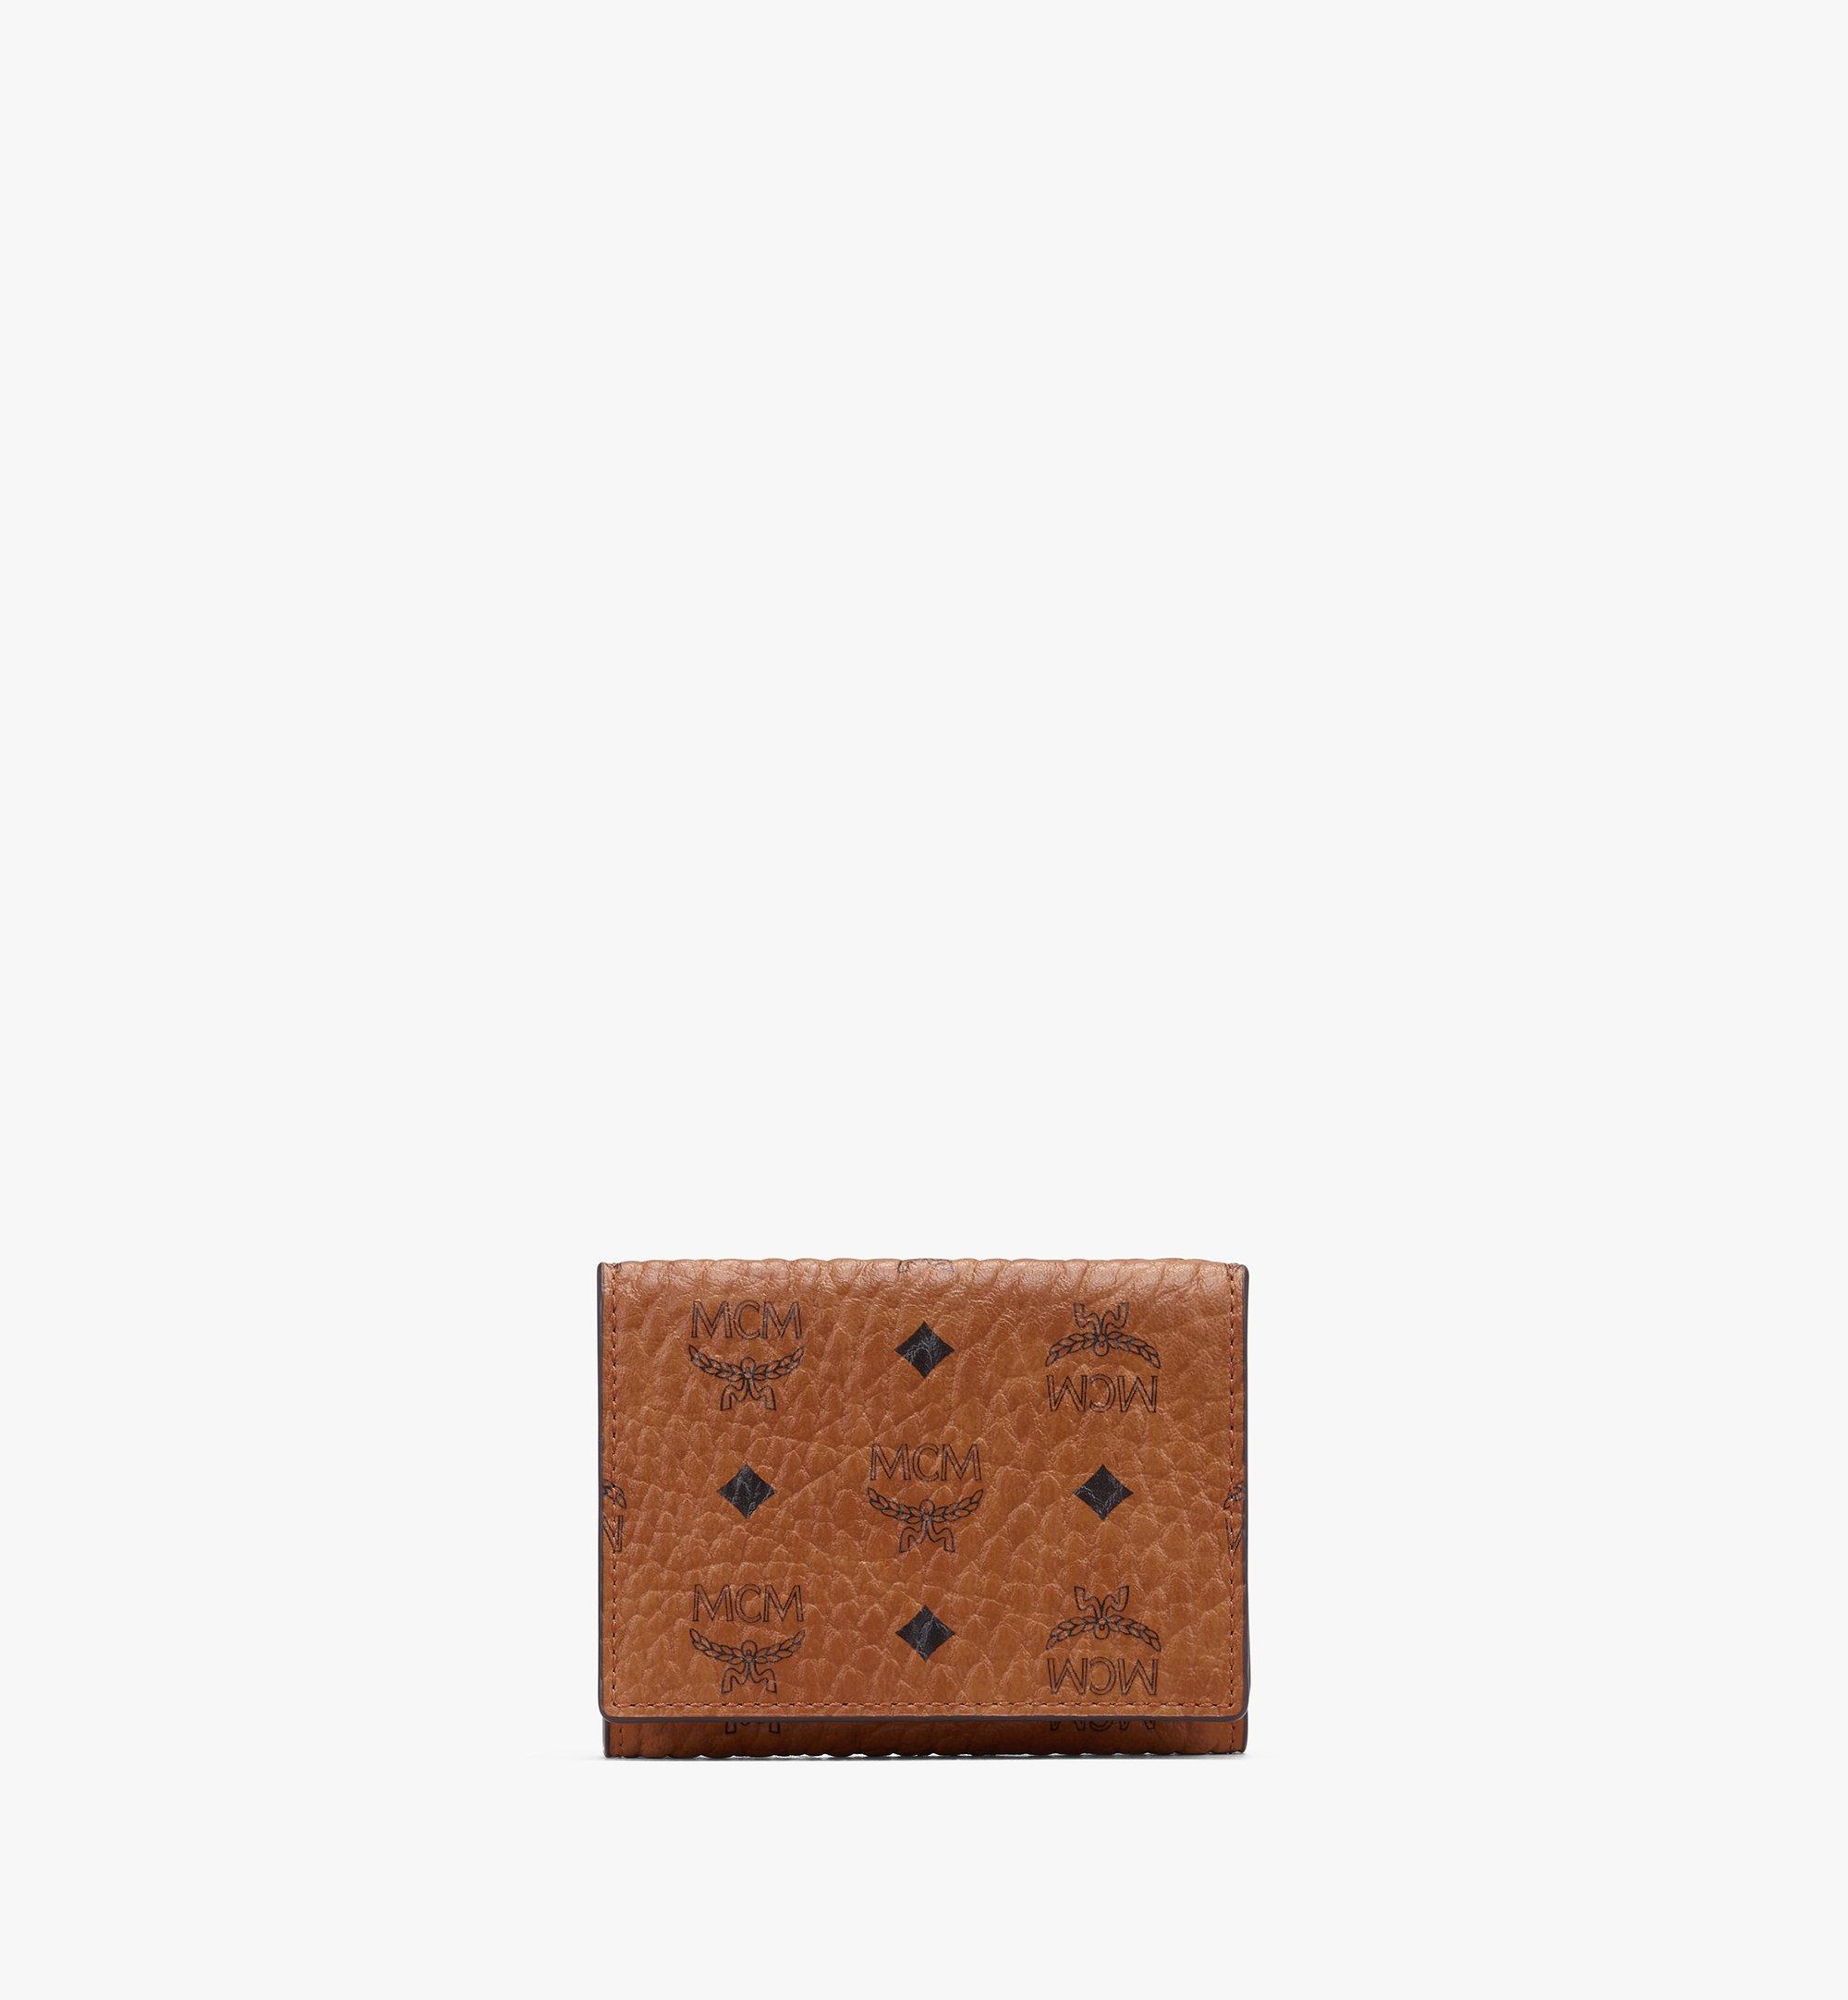 MCM Trifold Wallet in Visetos Cognac MYAASVI01CO001 Alternate View 1